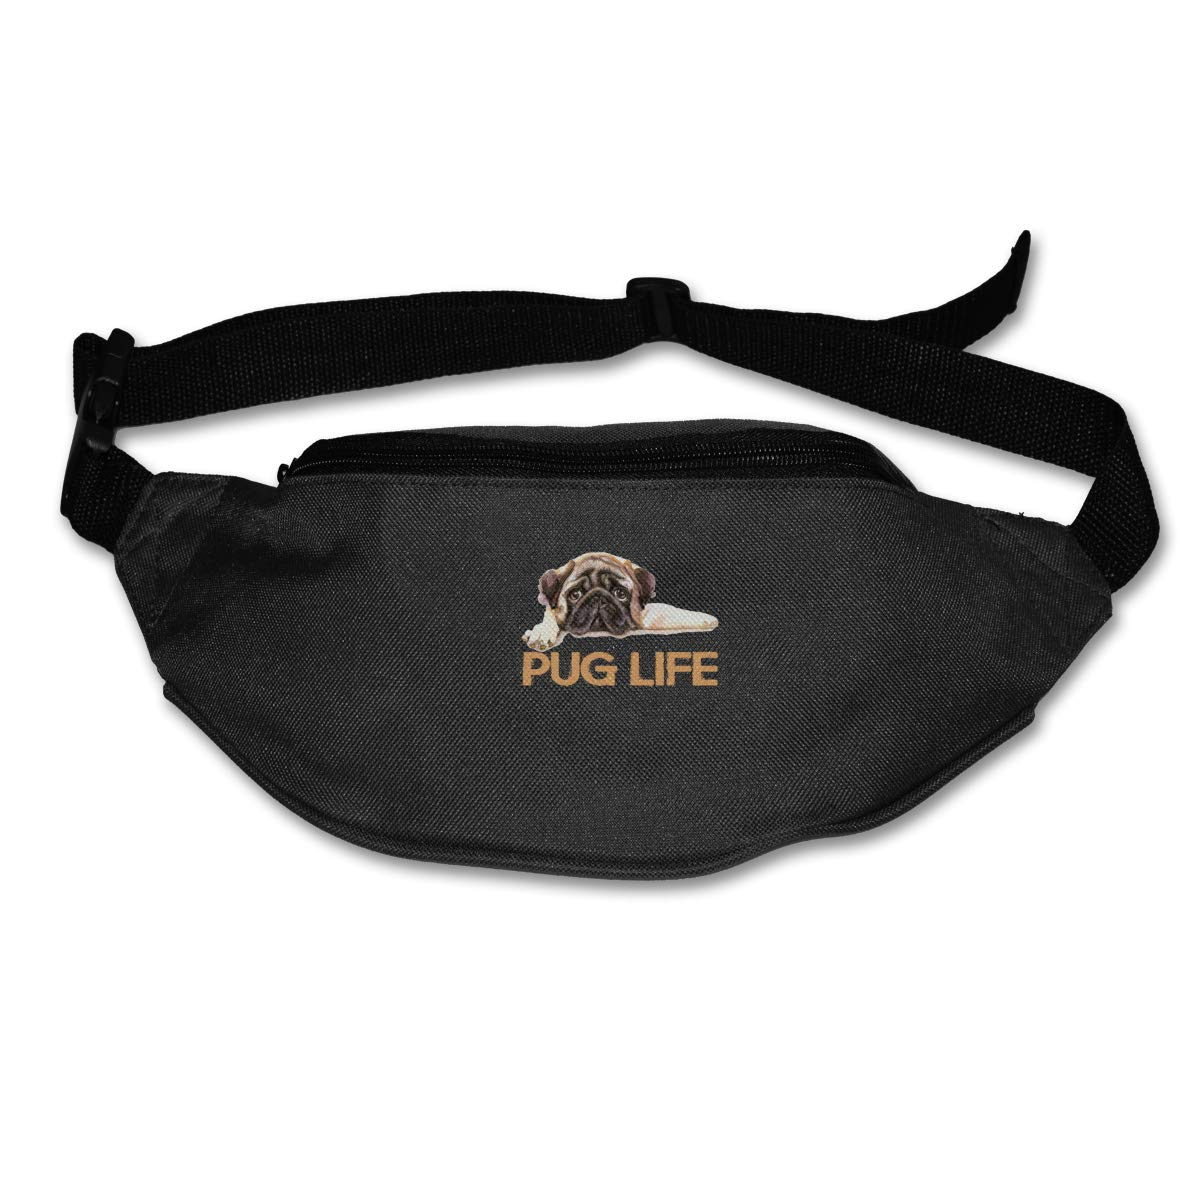 Pug Love Life Sport Waist Bag Fanny Pack Adjustable For Run